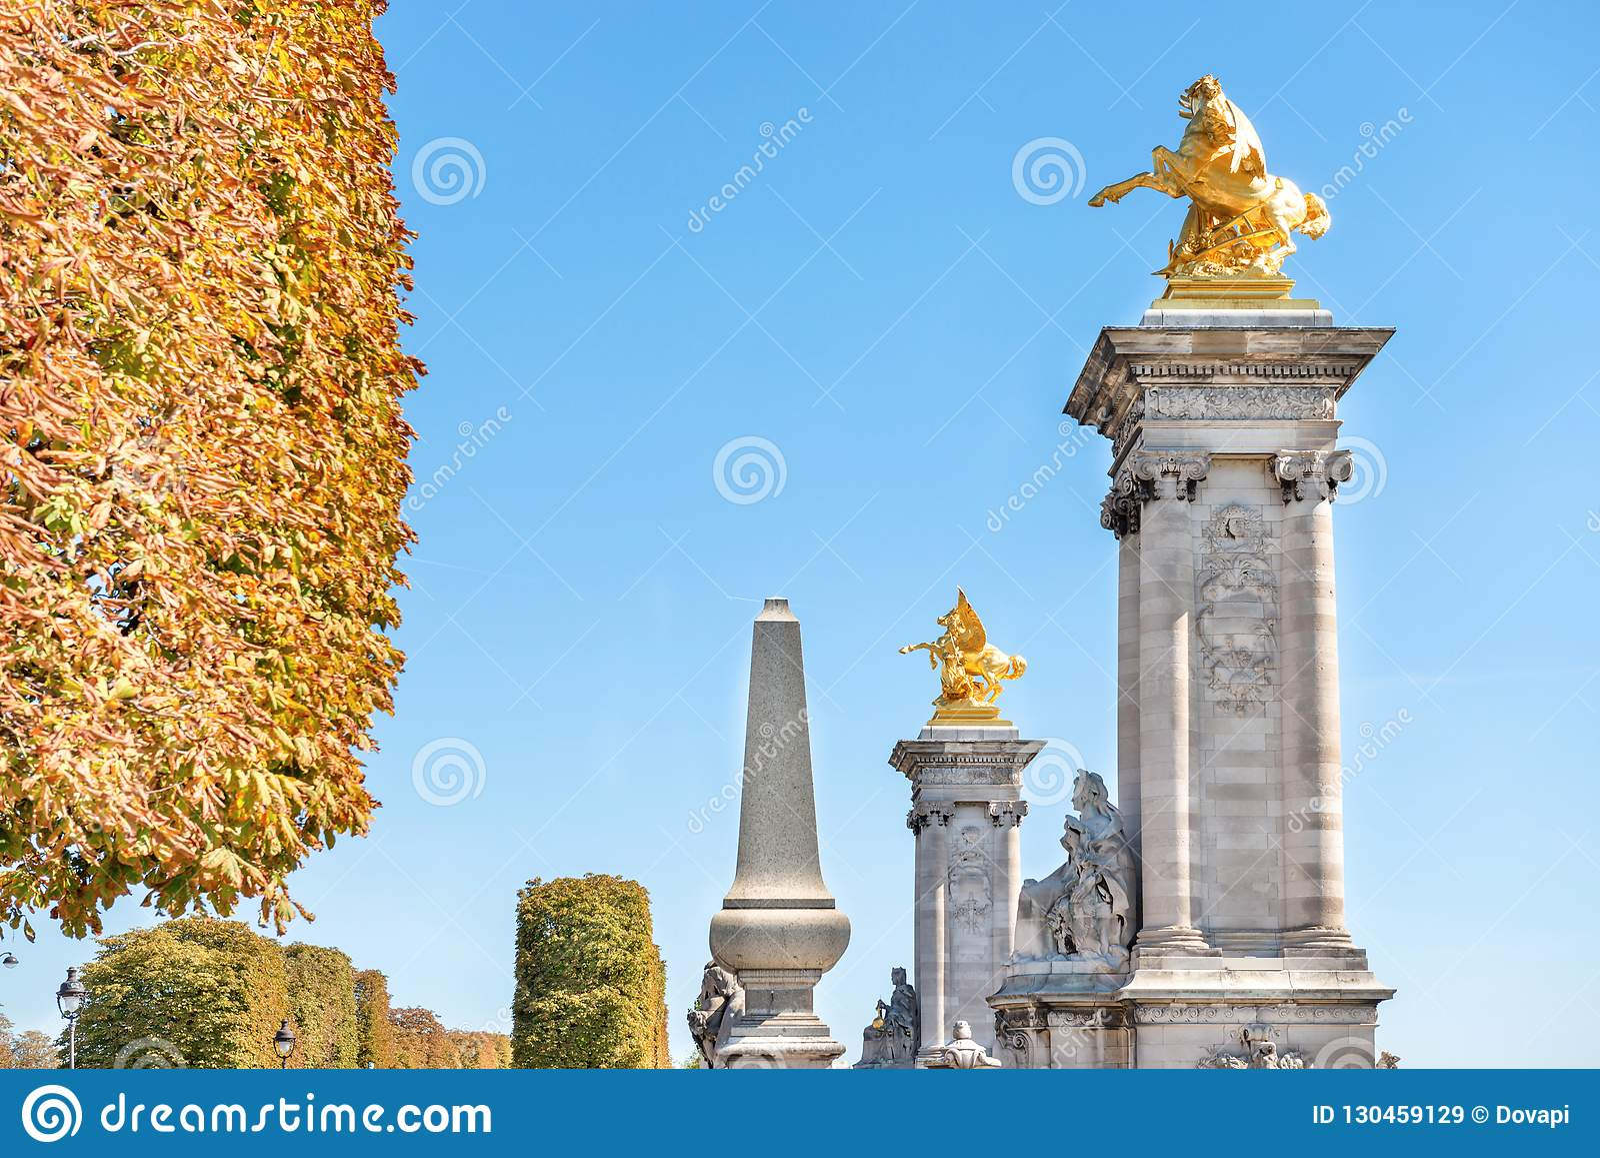 Paris - Gold Statue From Alexandre III Bridge Stock Photo